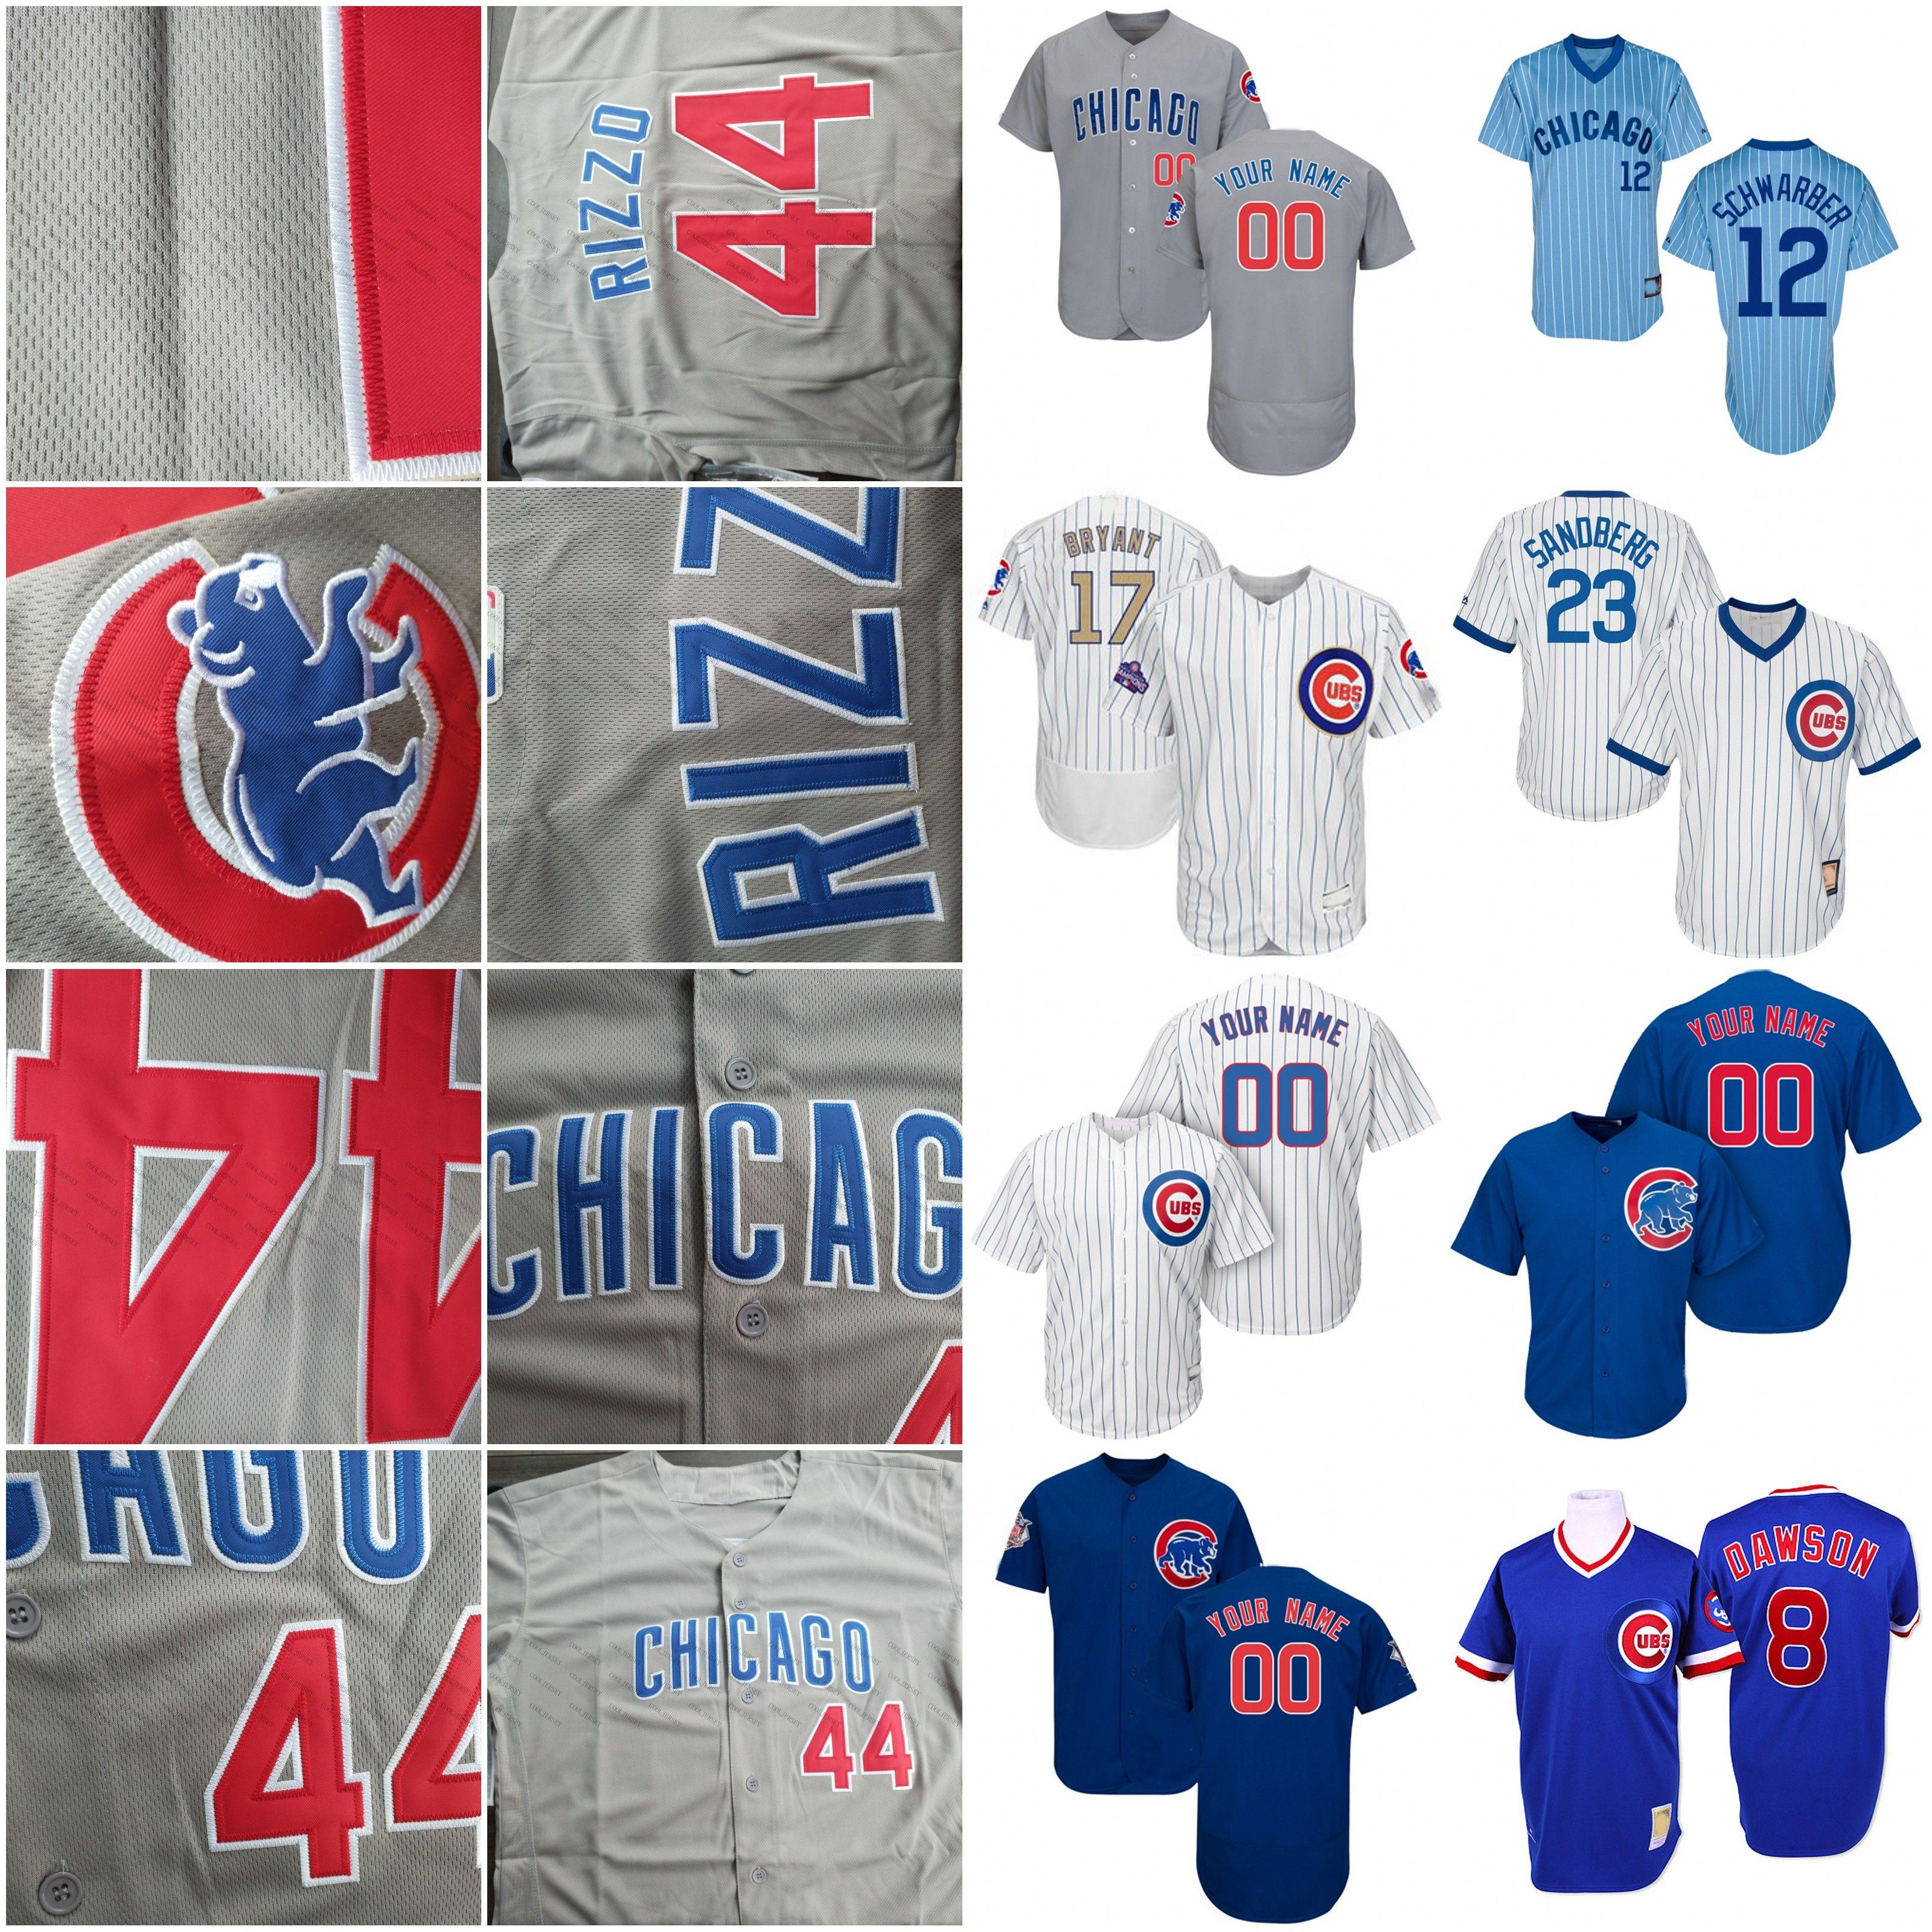 online store a05b2 ecee3 2019 Cubs Jersey Chicago 56 Kyle Ryan 12 Kyle Schwarber 46 Pedro Strop 61  Allen Webster Mark Zagunis 18 Ben Zobrist Baseball Men Women Youth